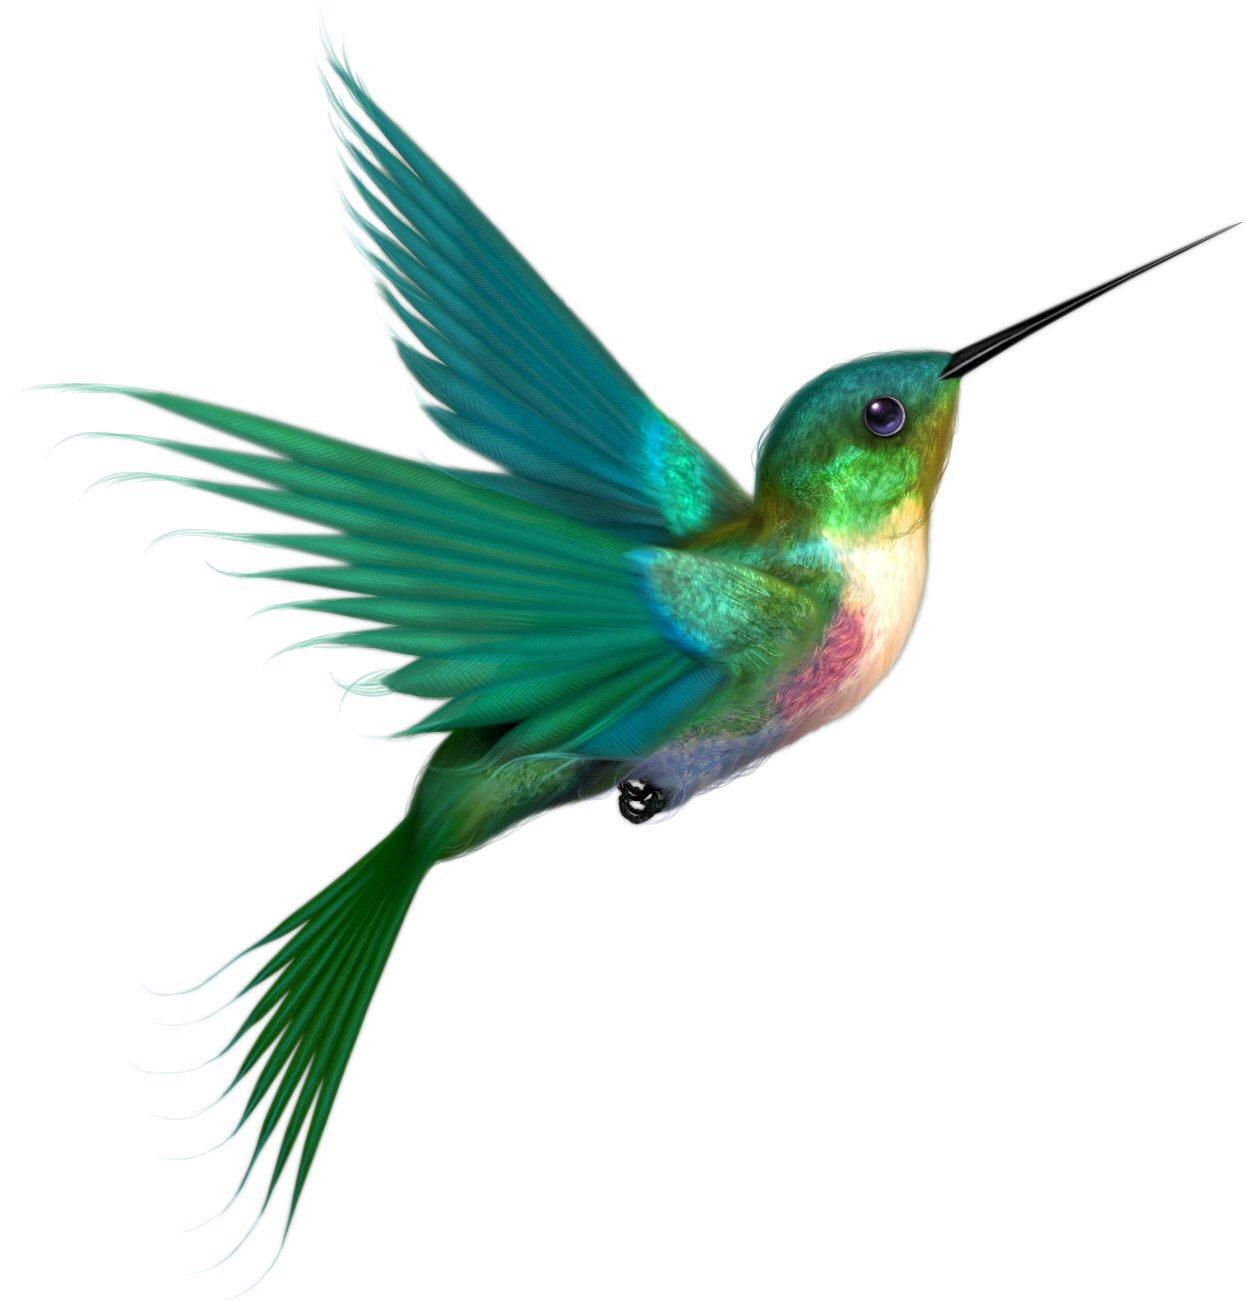 Blue clipart hummingbird ClipartMe Hummingbird Hummingbird Clipart Free